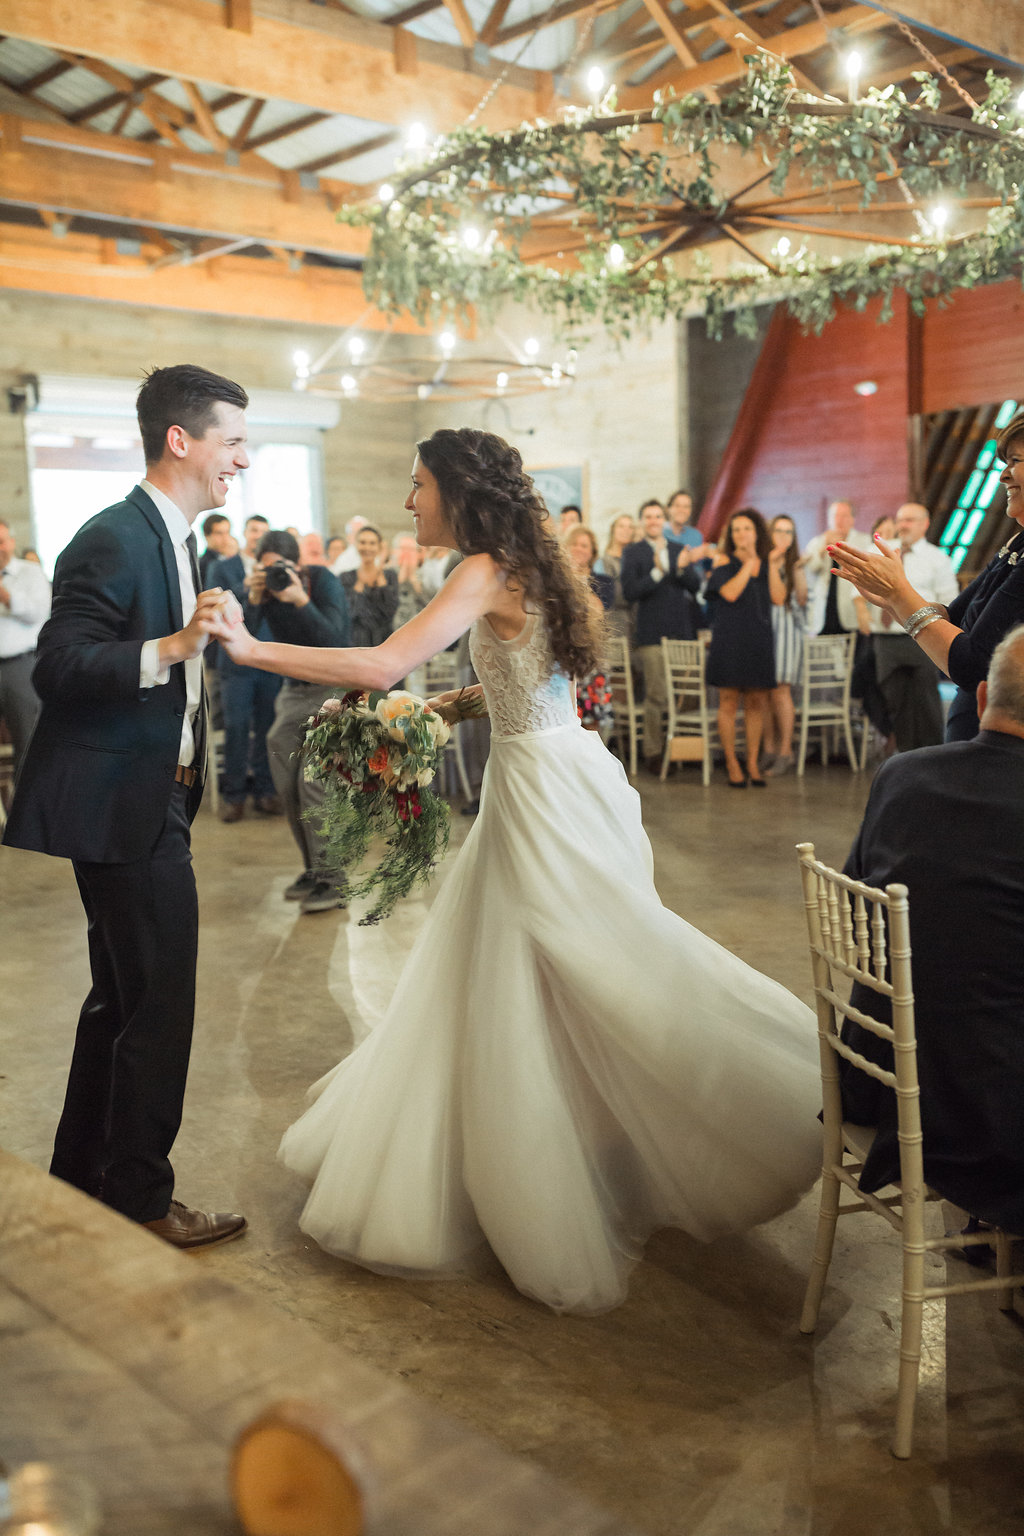 Honeysuckle-Hill-Weddings-Mallory-Patrick-109.jpg